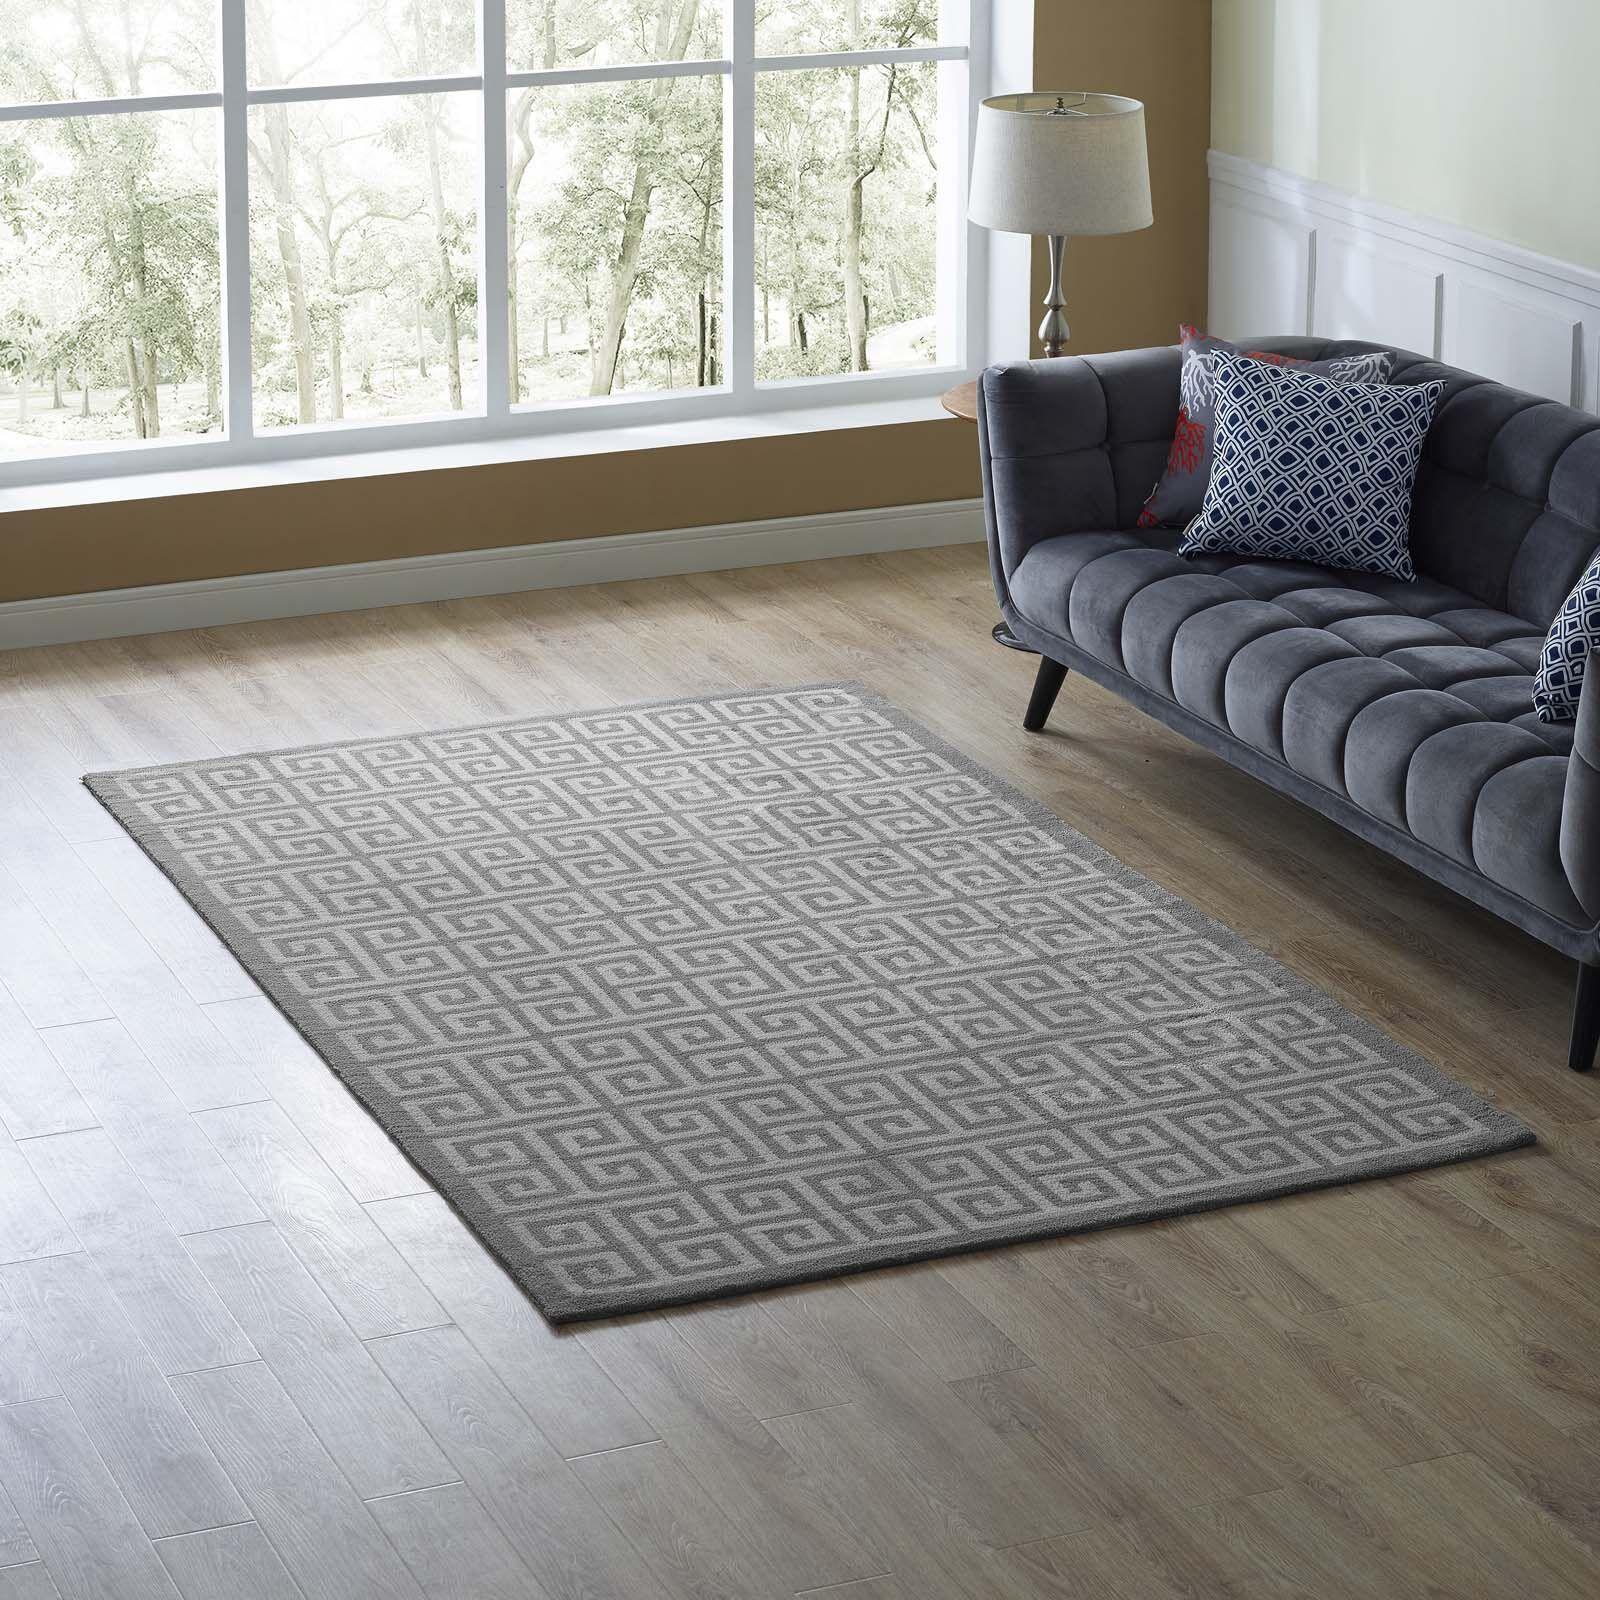 Selman Greek Key White/Light Gray Area Rug Rug Size: Rectangle 5' x 8'